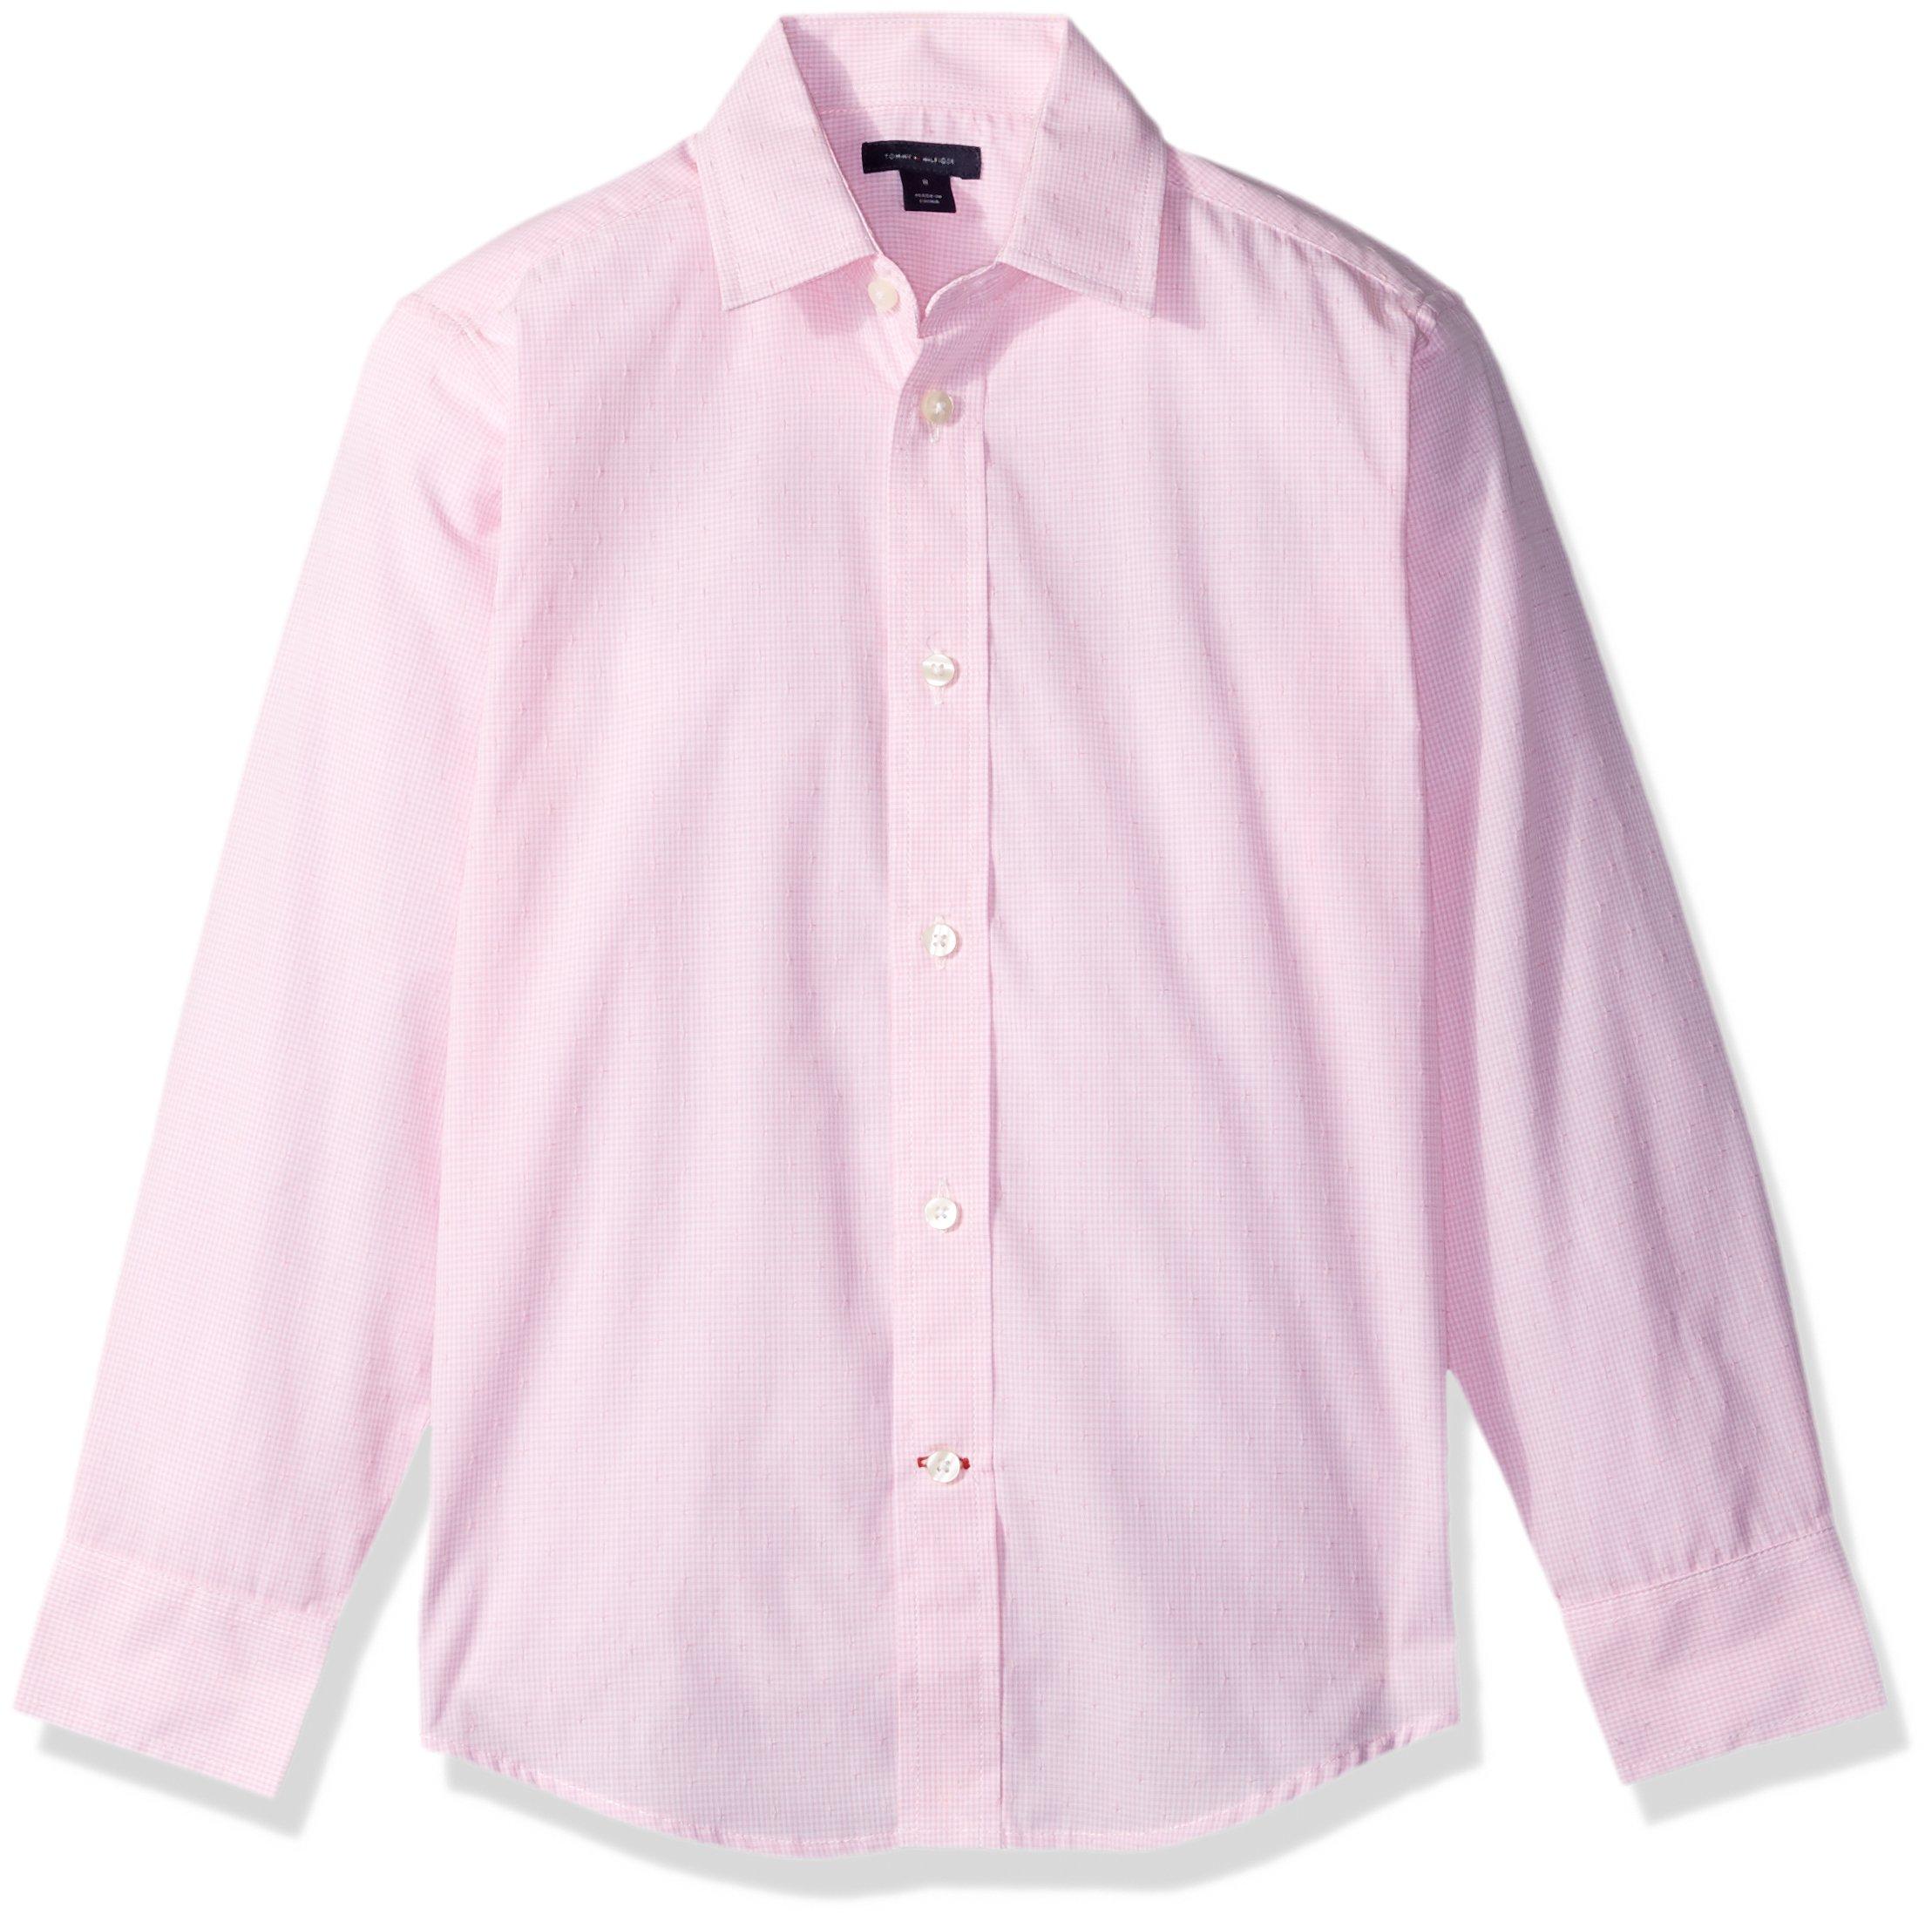 Tommy Hilfiger Boys' Cross Gingham Shirt, Light Pink, 16 by Tommy Hilfiger (Image #2)